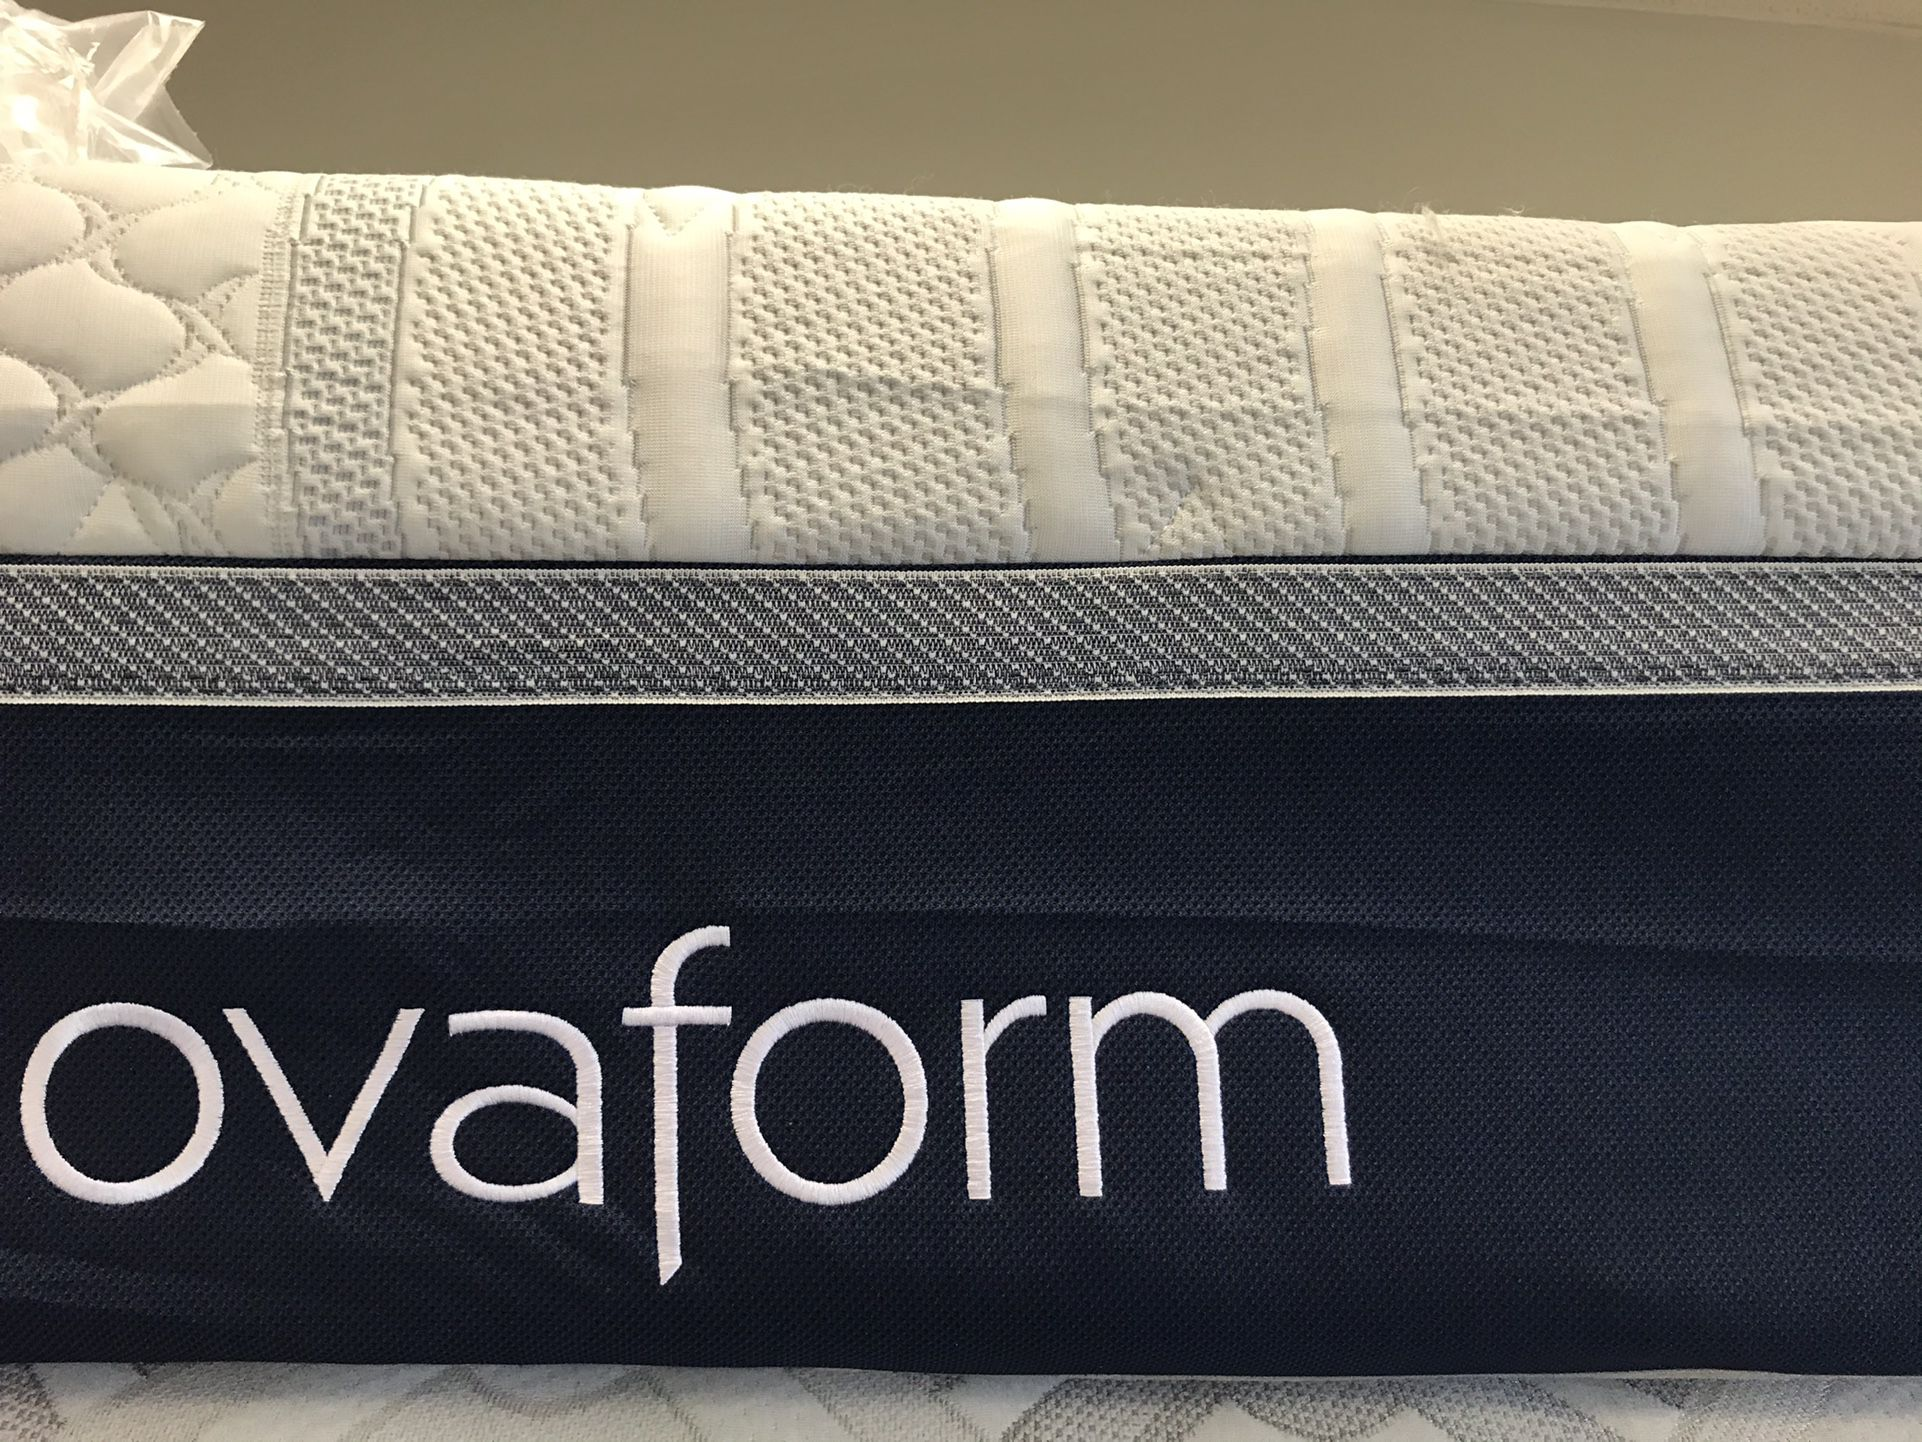 King 14 Inch NOVAFORM cool Gel Memory Foam mattress $375 Can Deliver